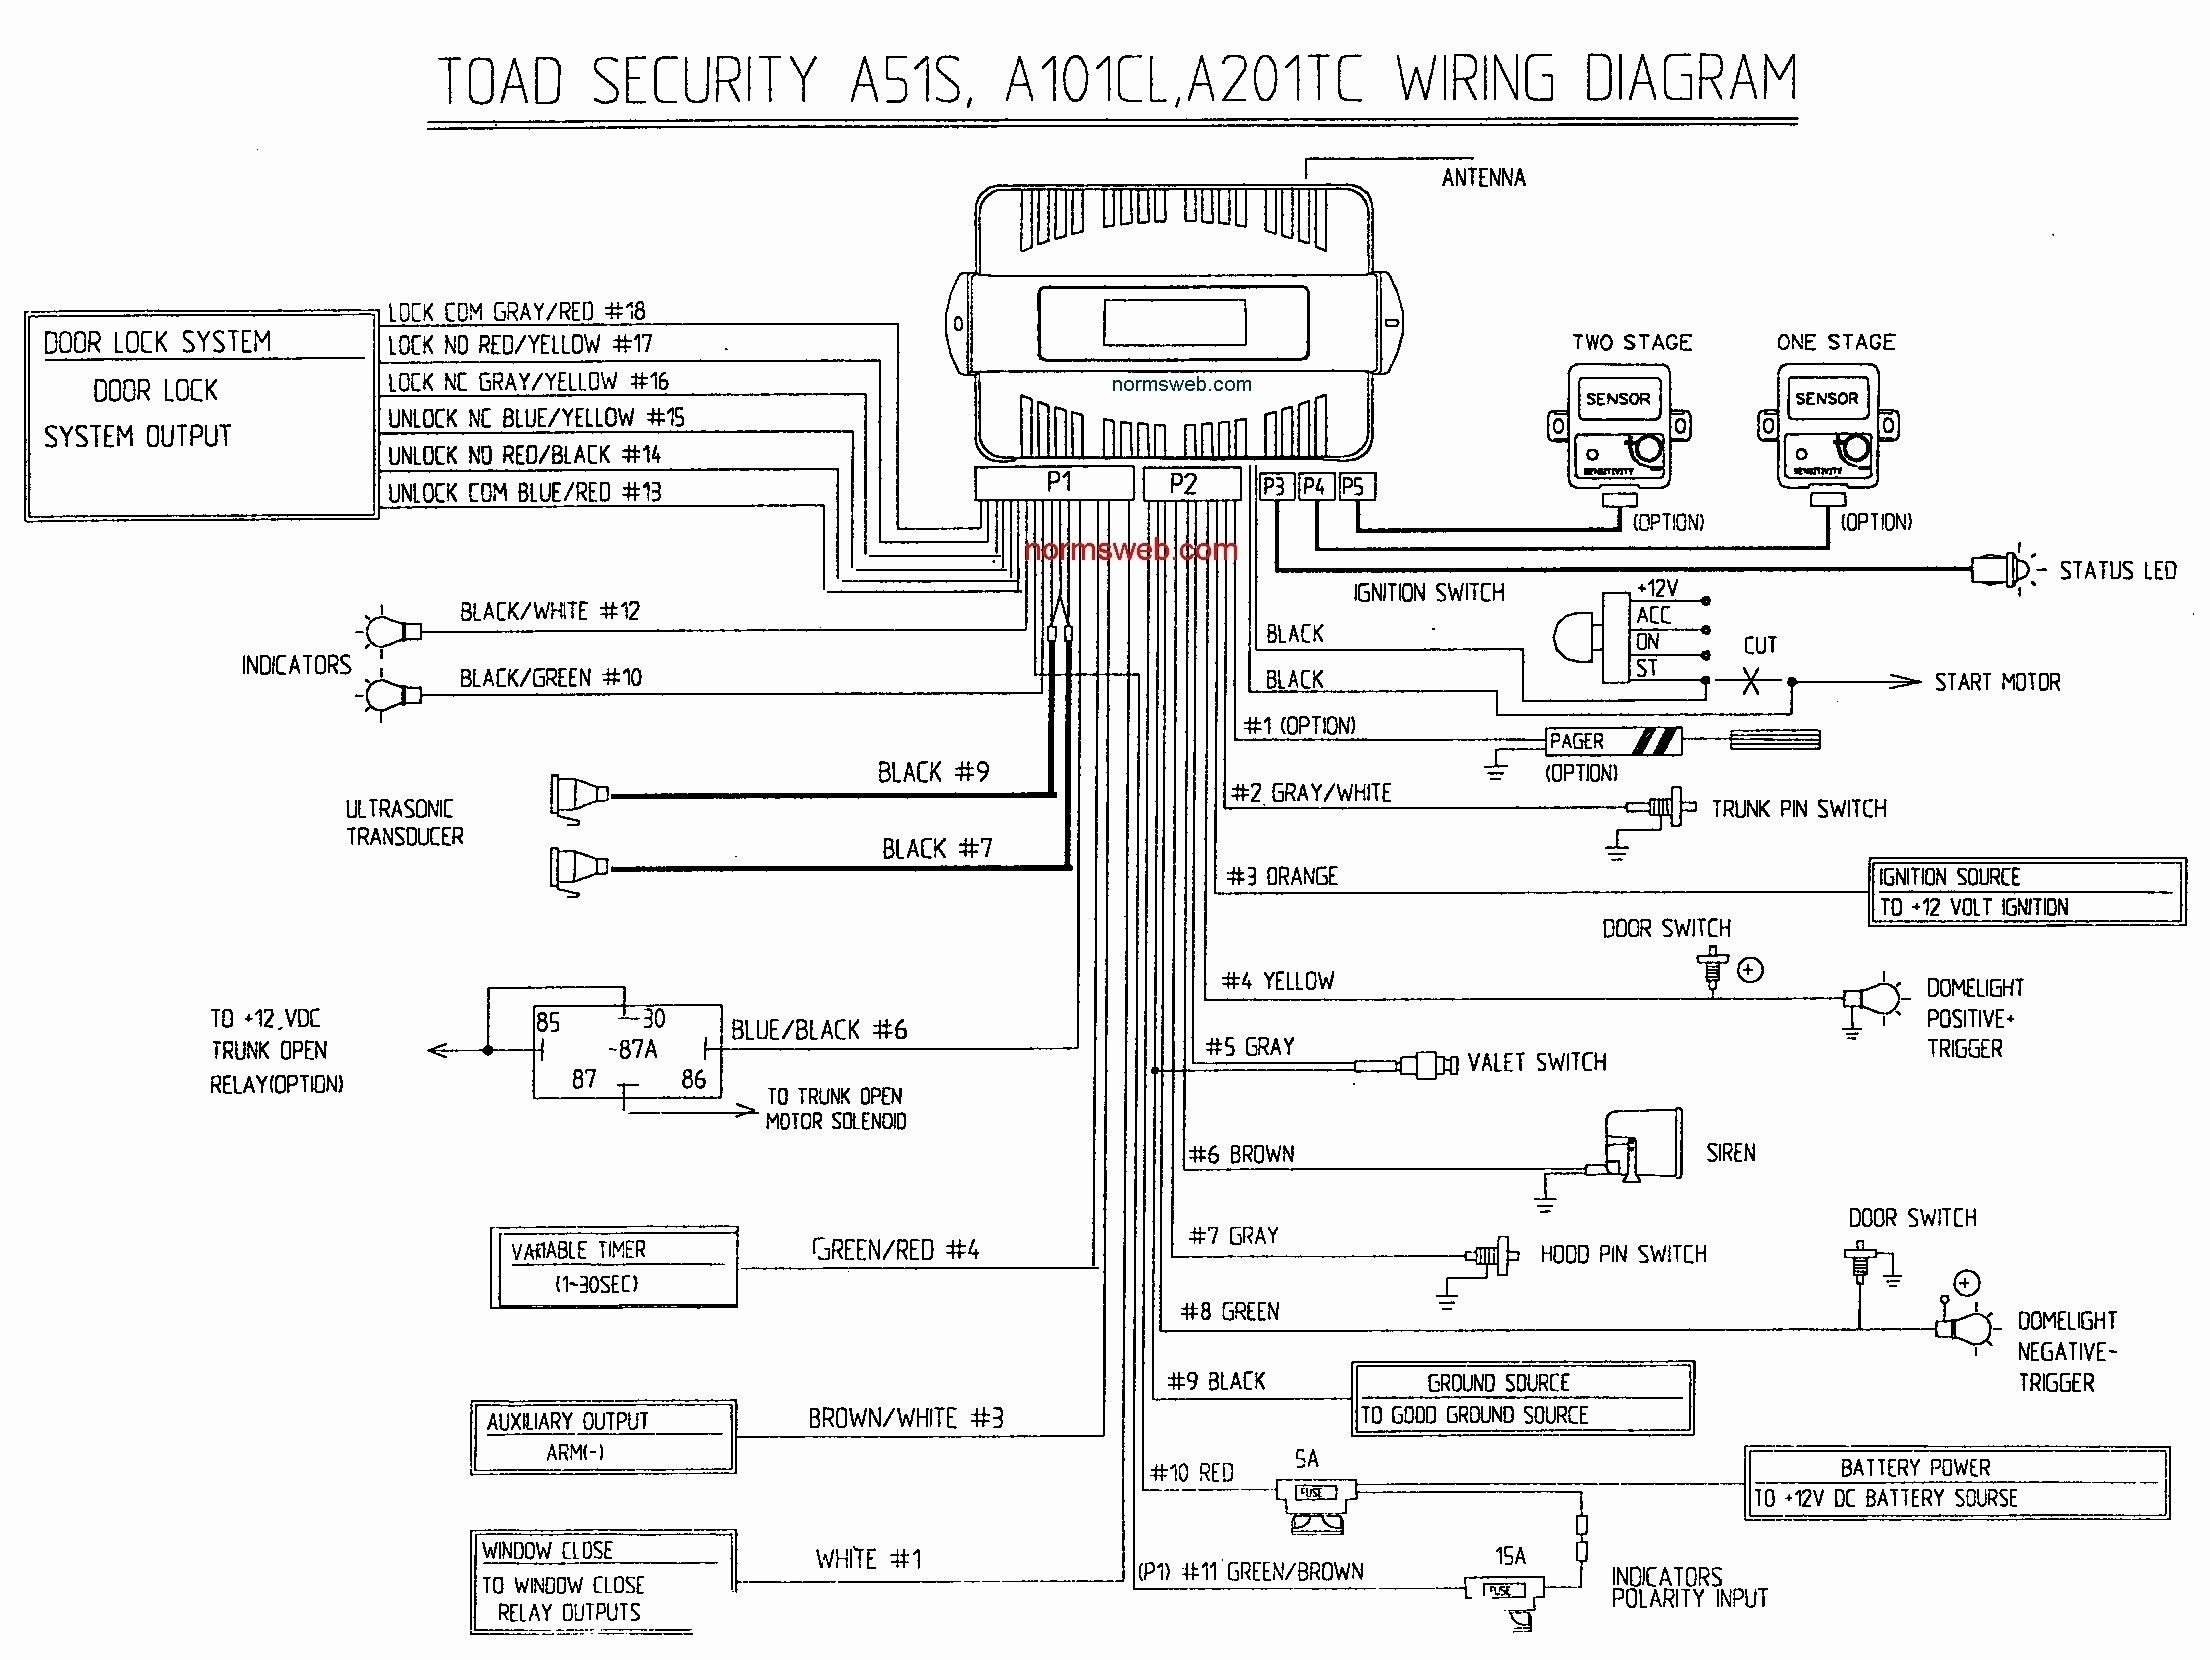 Bulldog Security Wiring Diagrams Alarm Systems For Home Car Alarm Home Security Systems